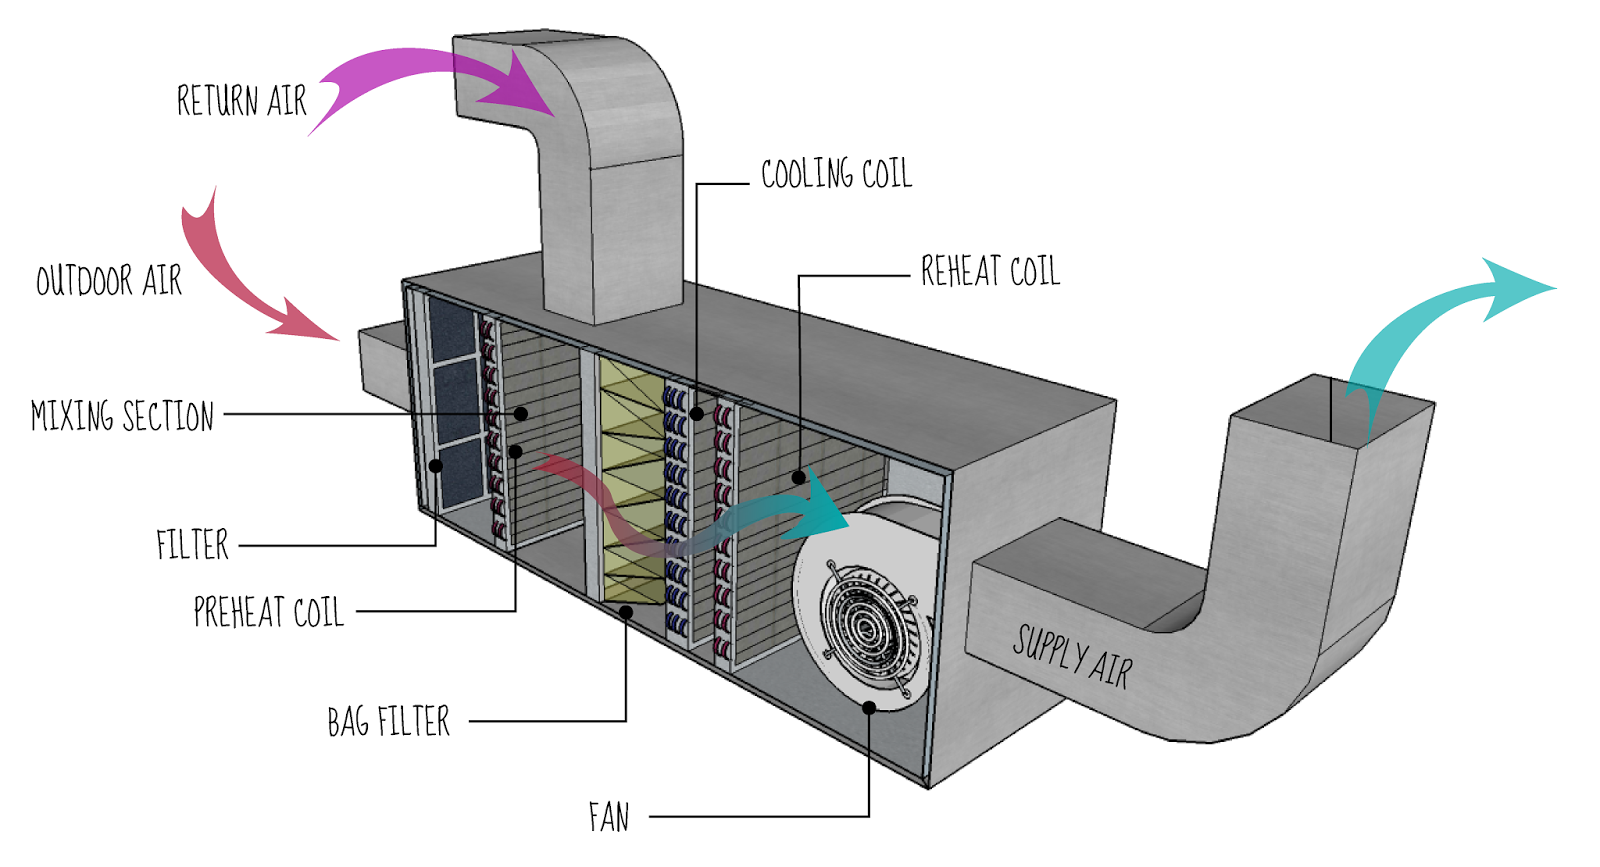 hight resolution of basic principles of a hvac system engineering updates rh teenknowlege blogspot com commercial hvac diagram hvac plenum diagram